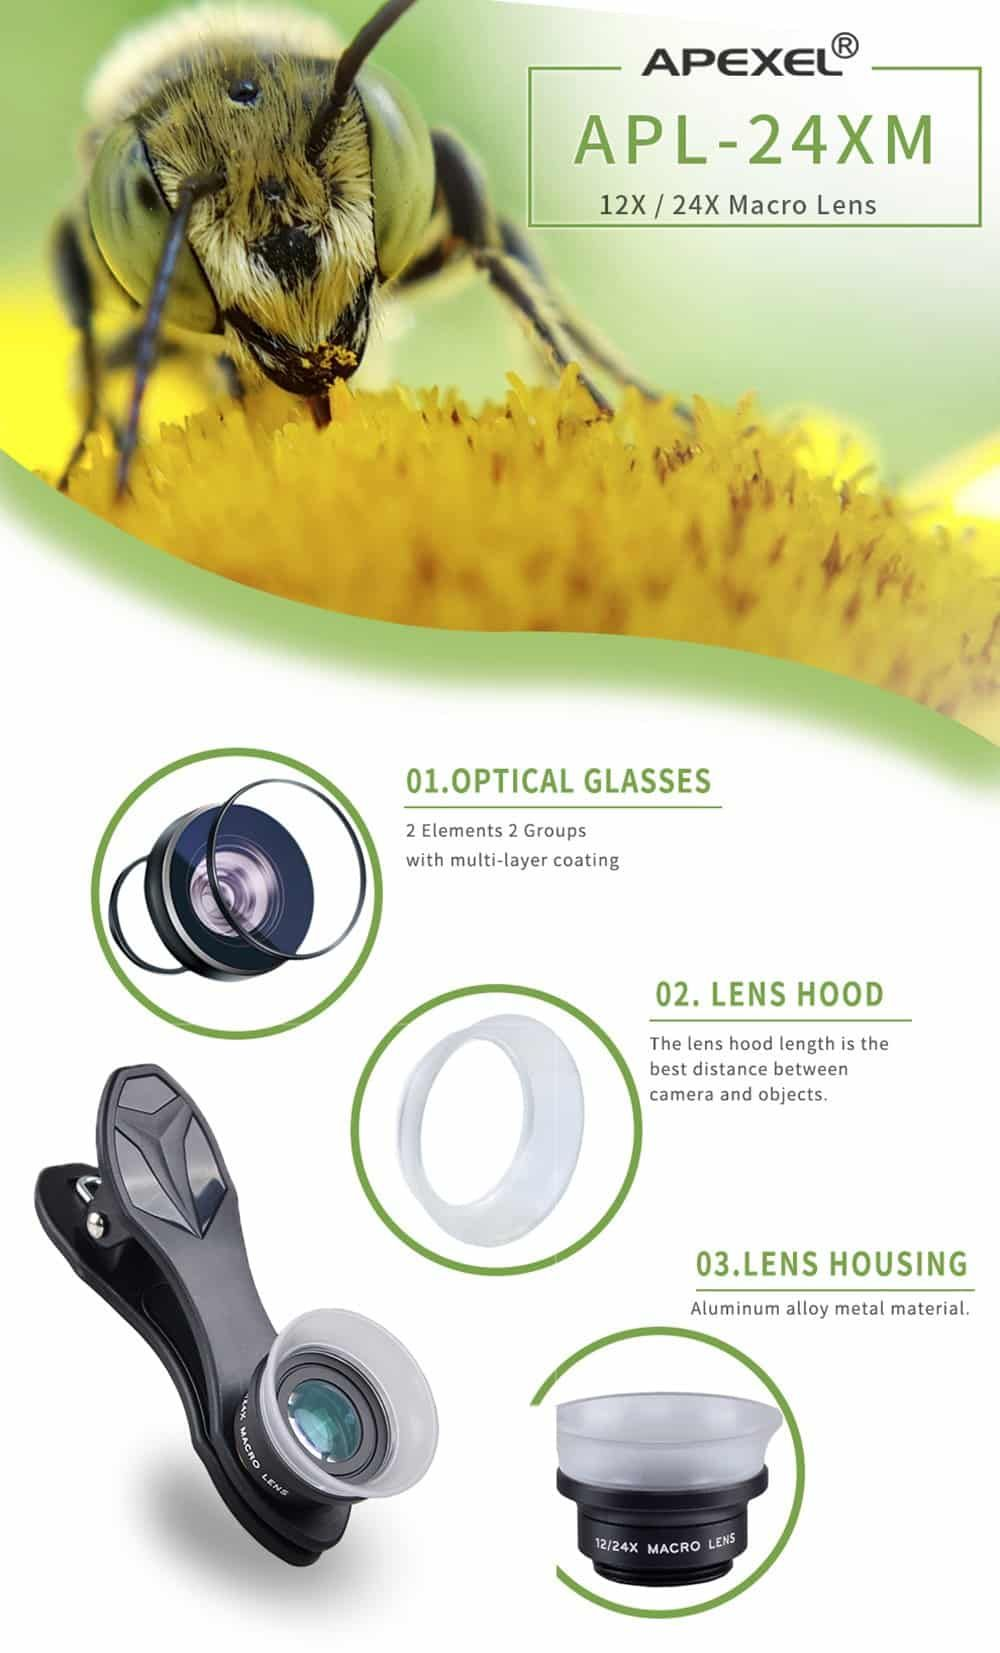 Apexel 12x 24x Macro Lens For Smartphone Macro Lens Smartphone Price Lens